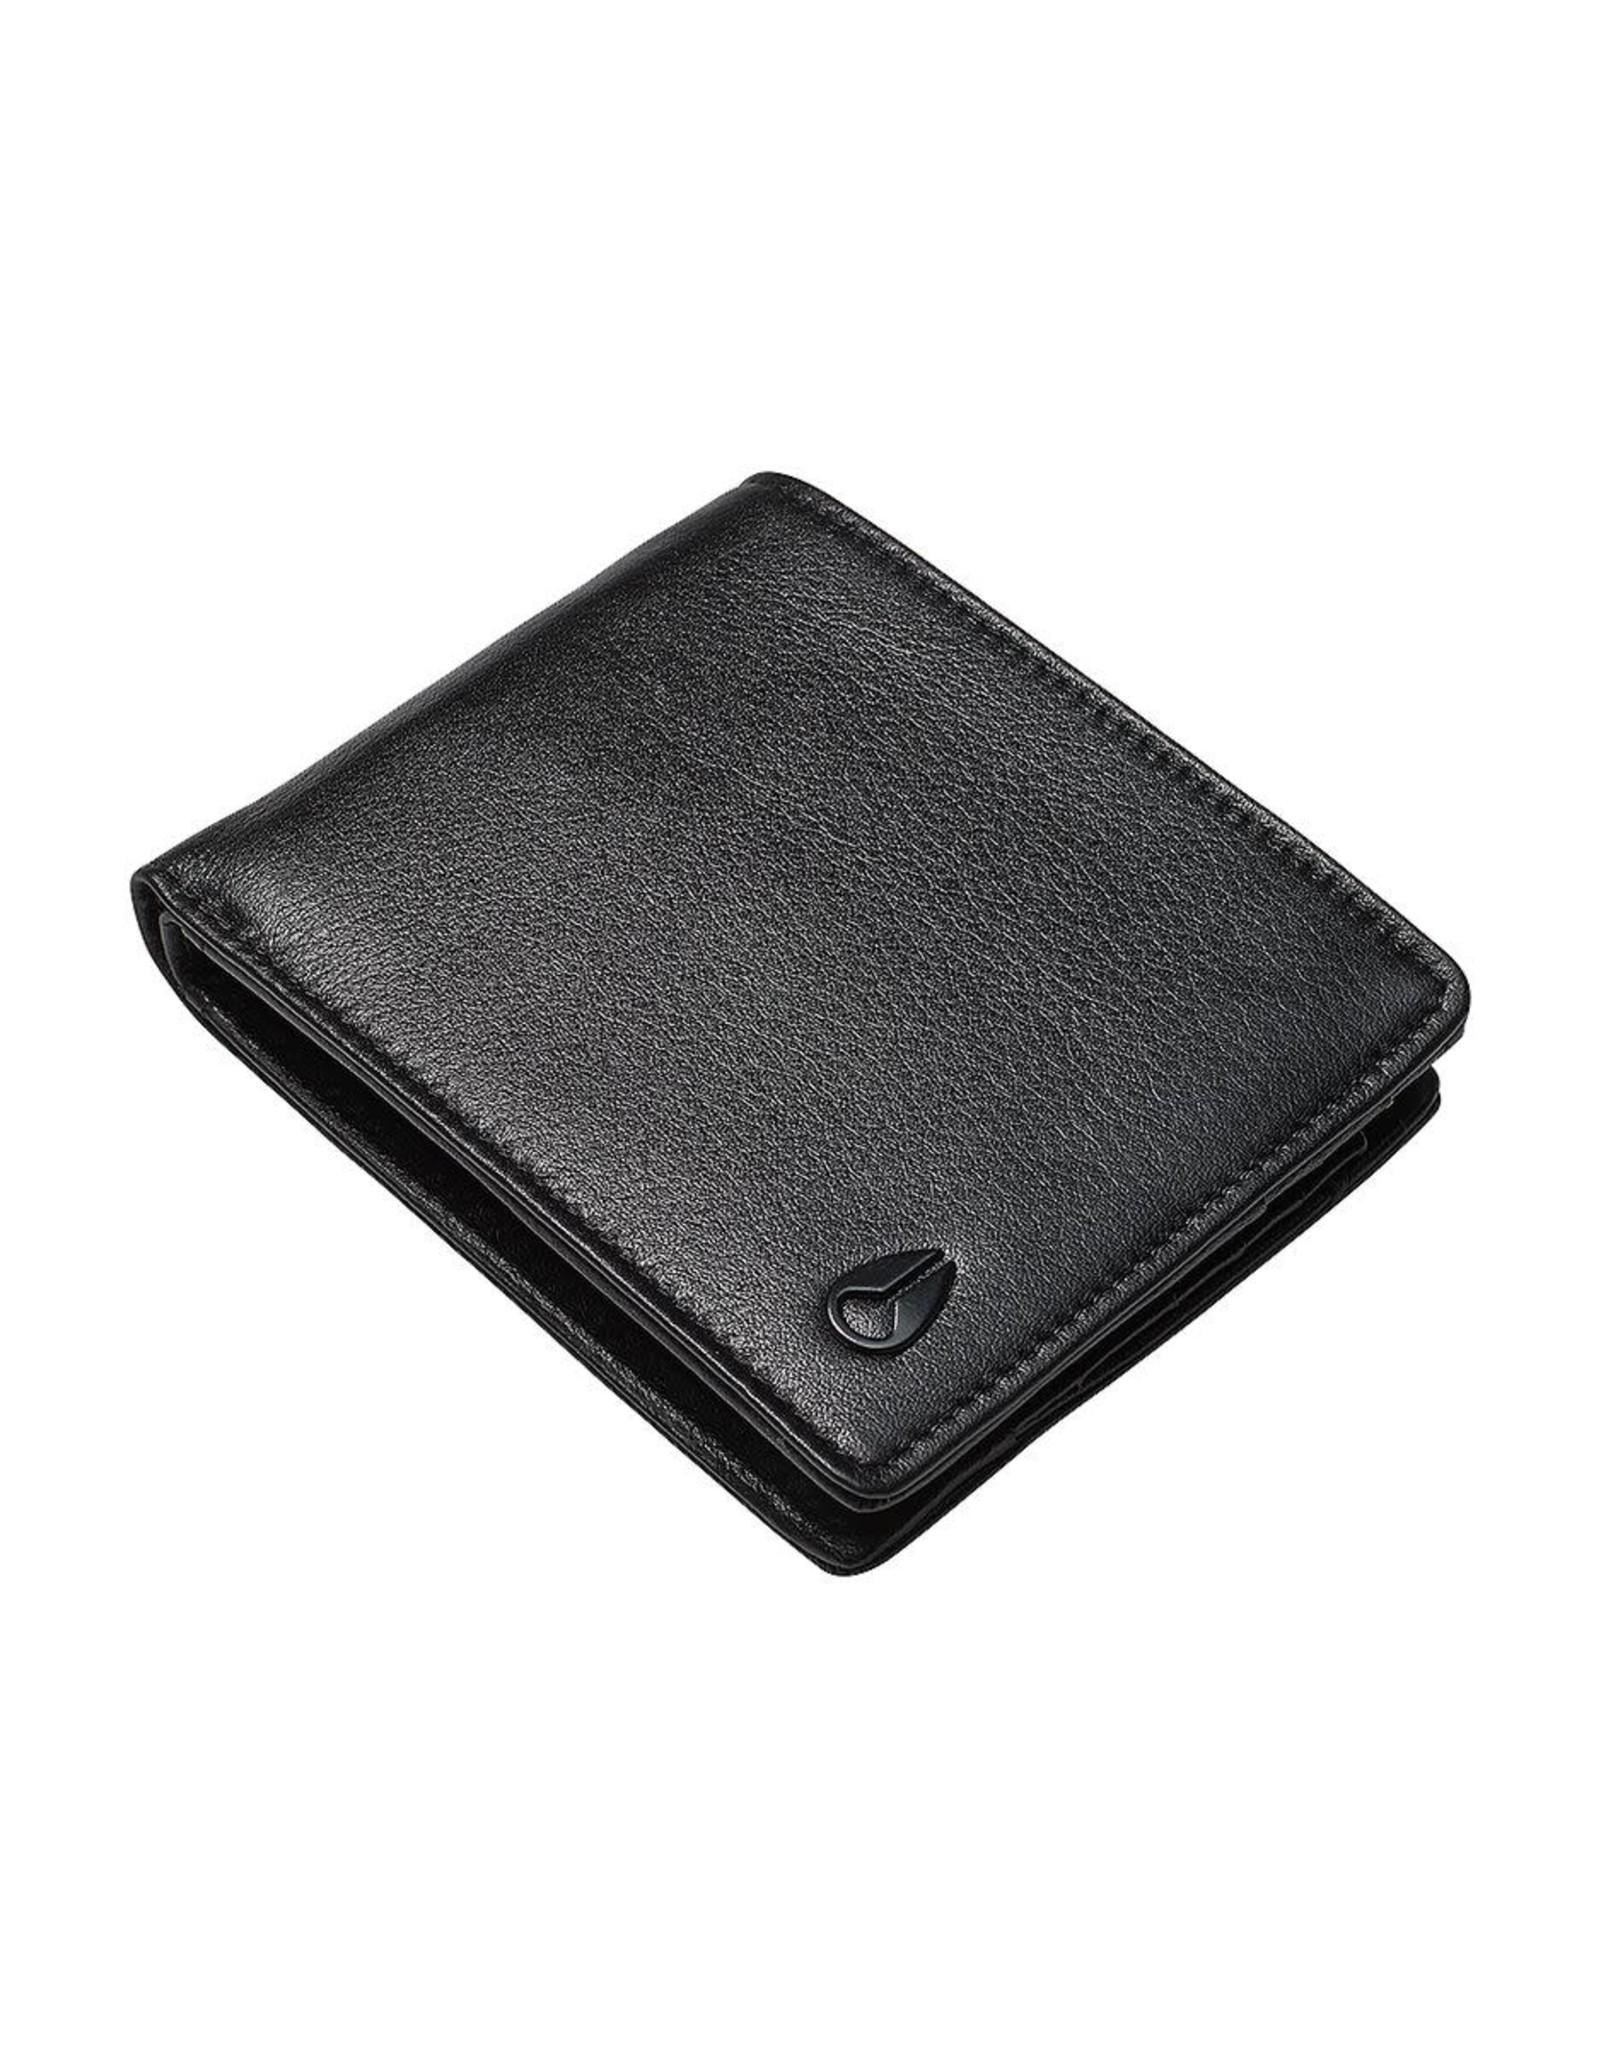 nixon Nixon -  Portefeuille homme pass vegan leather coin black